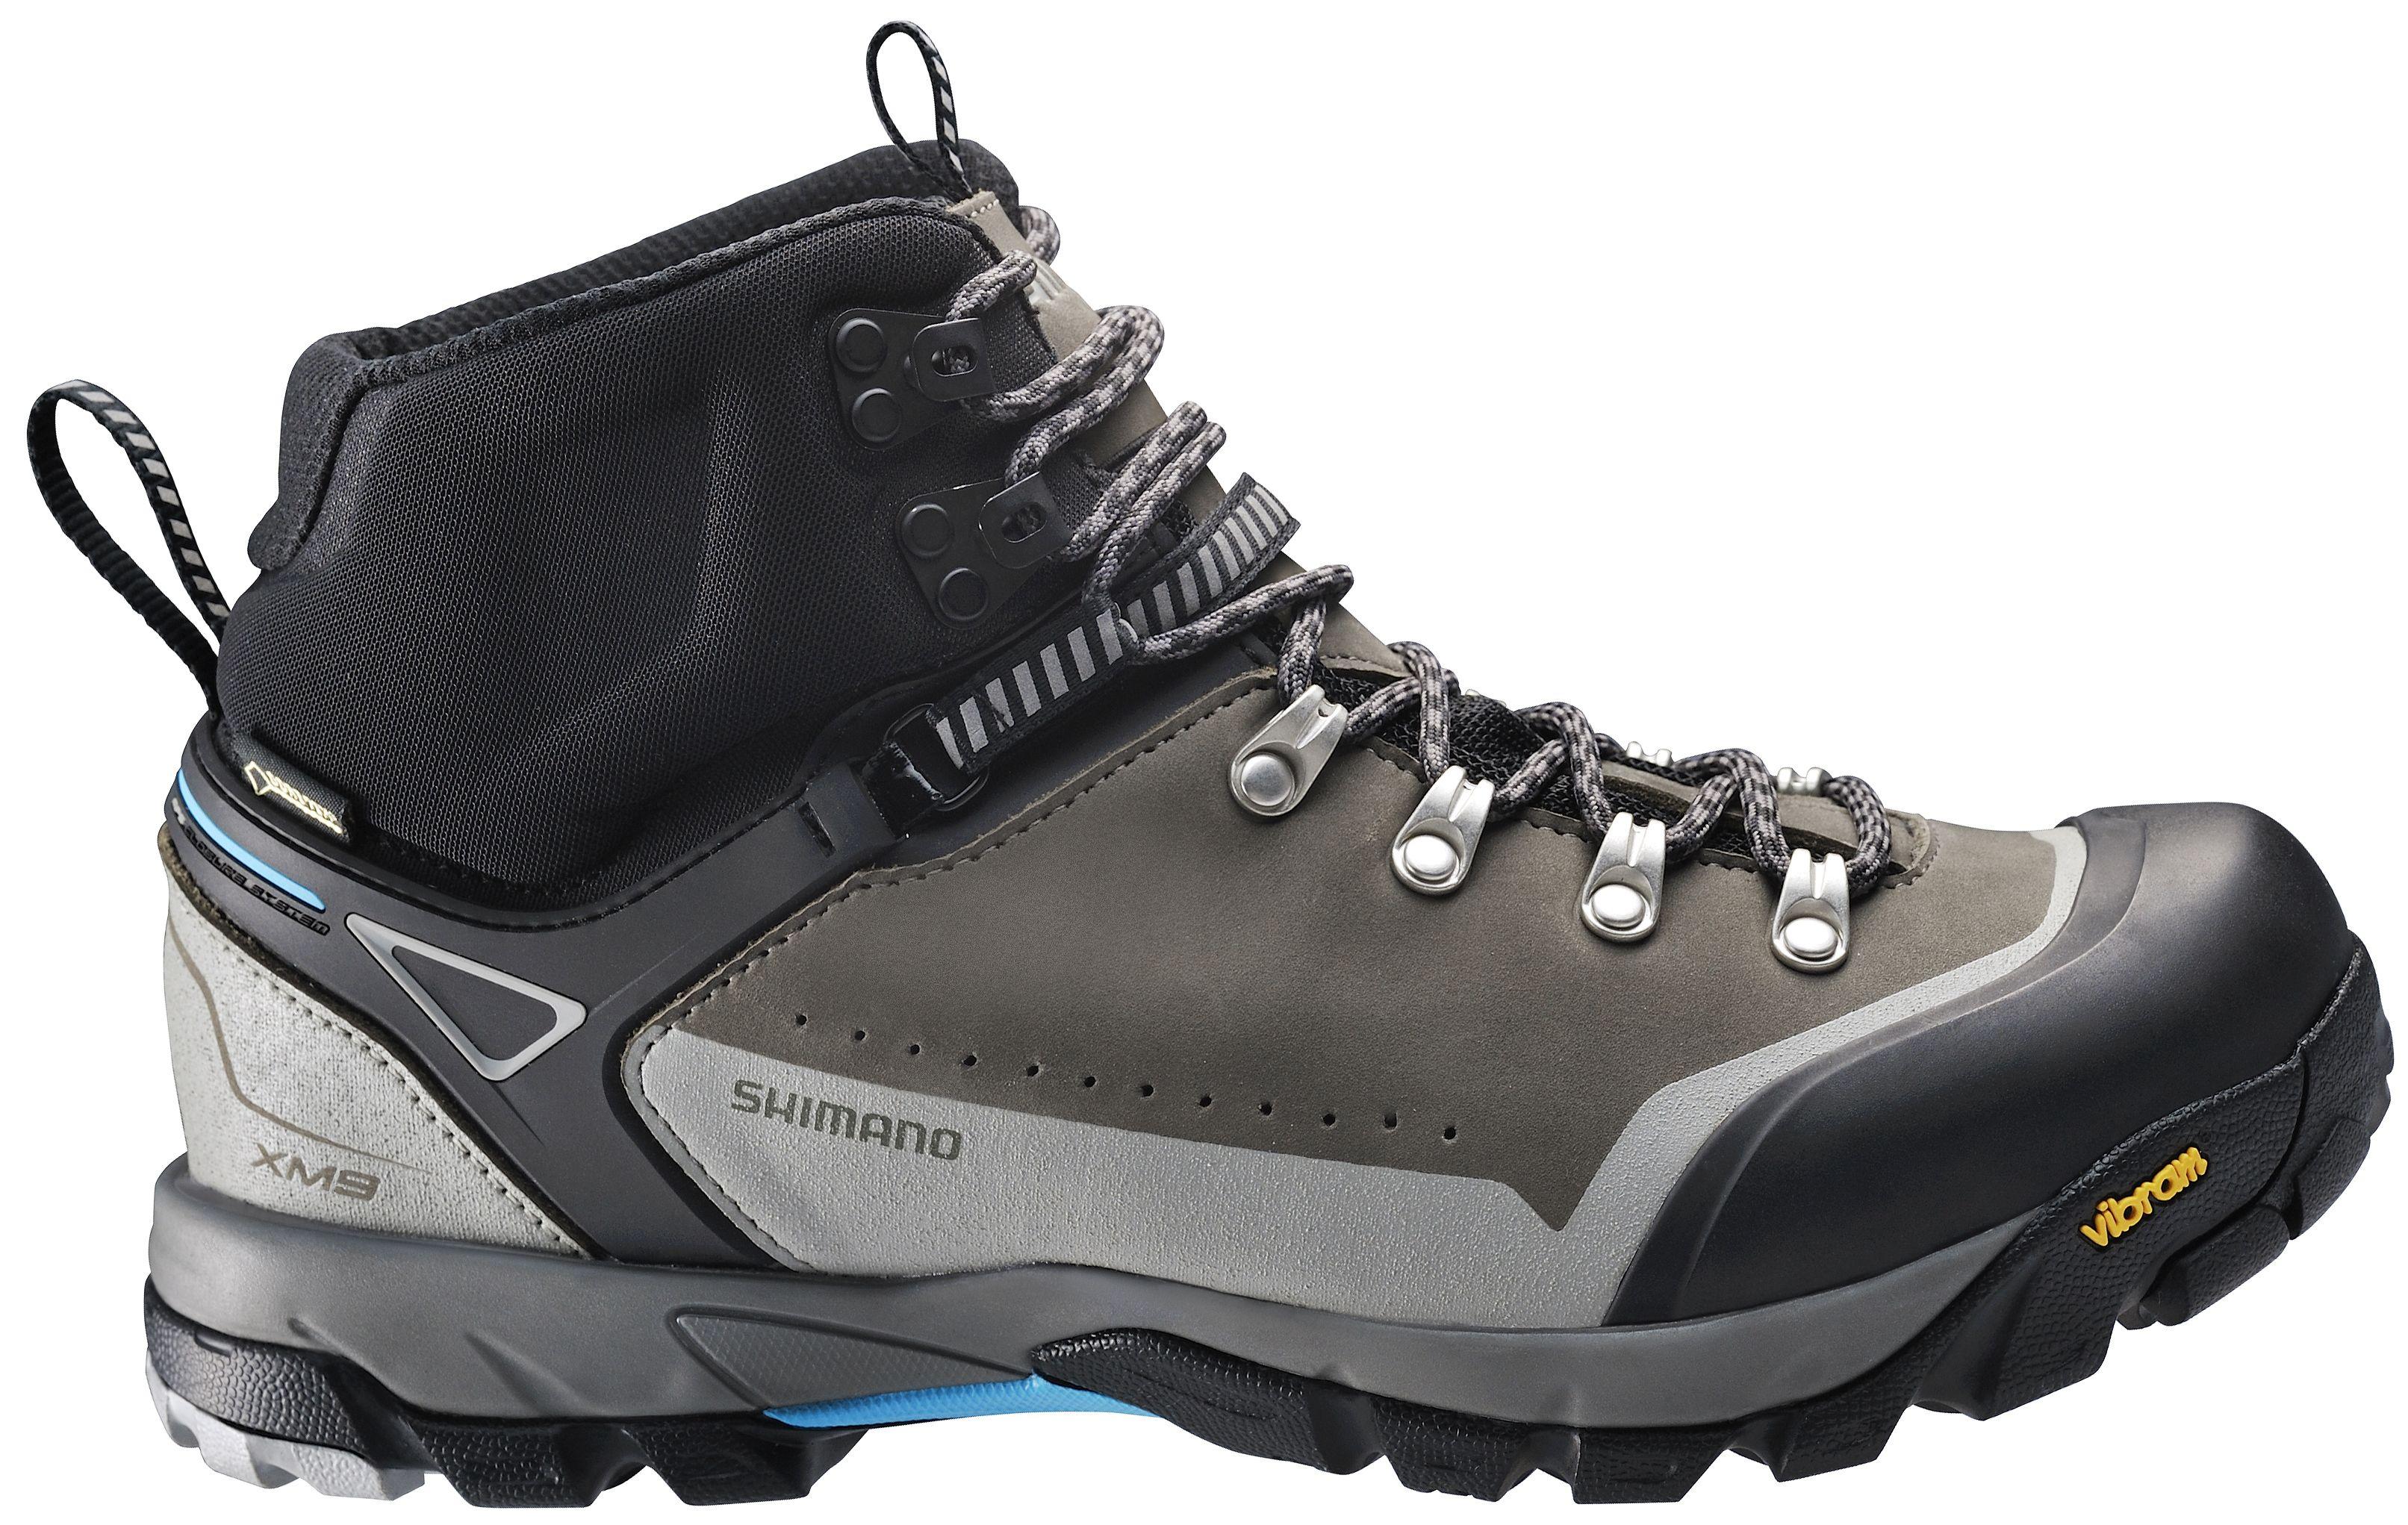 5636318c687a53 Imagen relacionada Mtb Shoes, Cycling Shoes, Hiking Shoes, Shoes Sandals,  Ecco Shoes